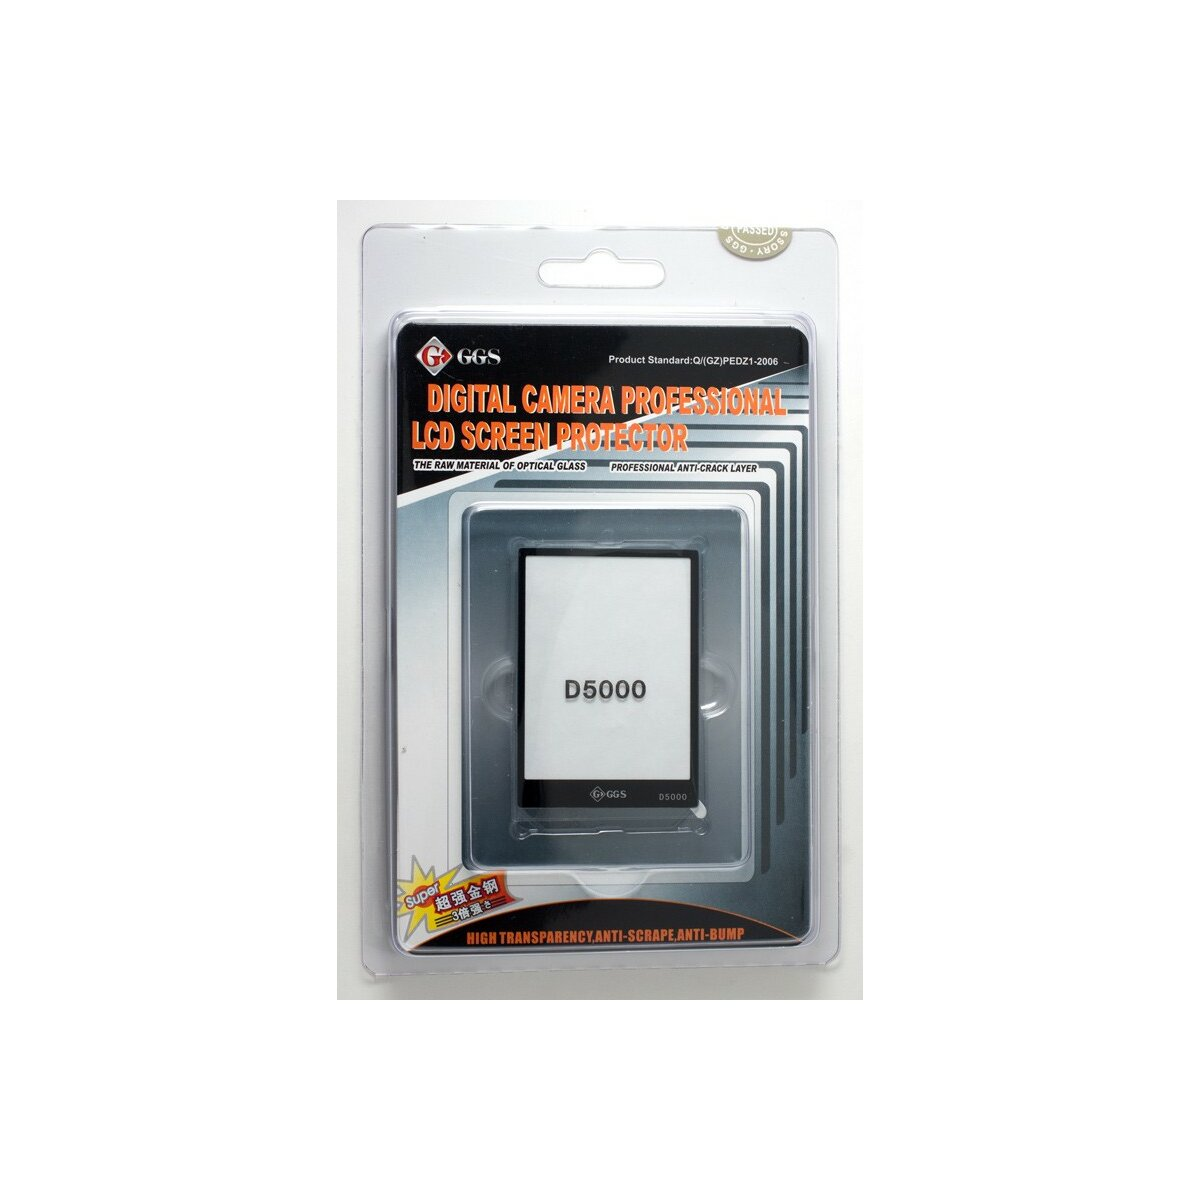 GGS Displayschutz aus Glas fuer Nikon D5000 optisch verguetetes Echtglas Protector